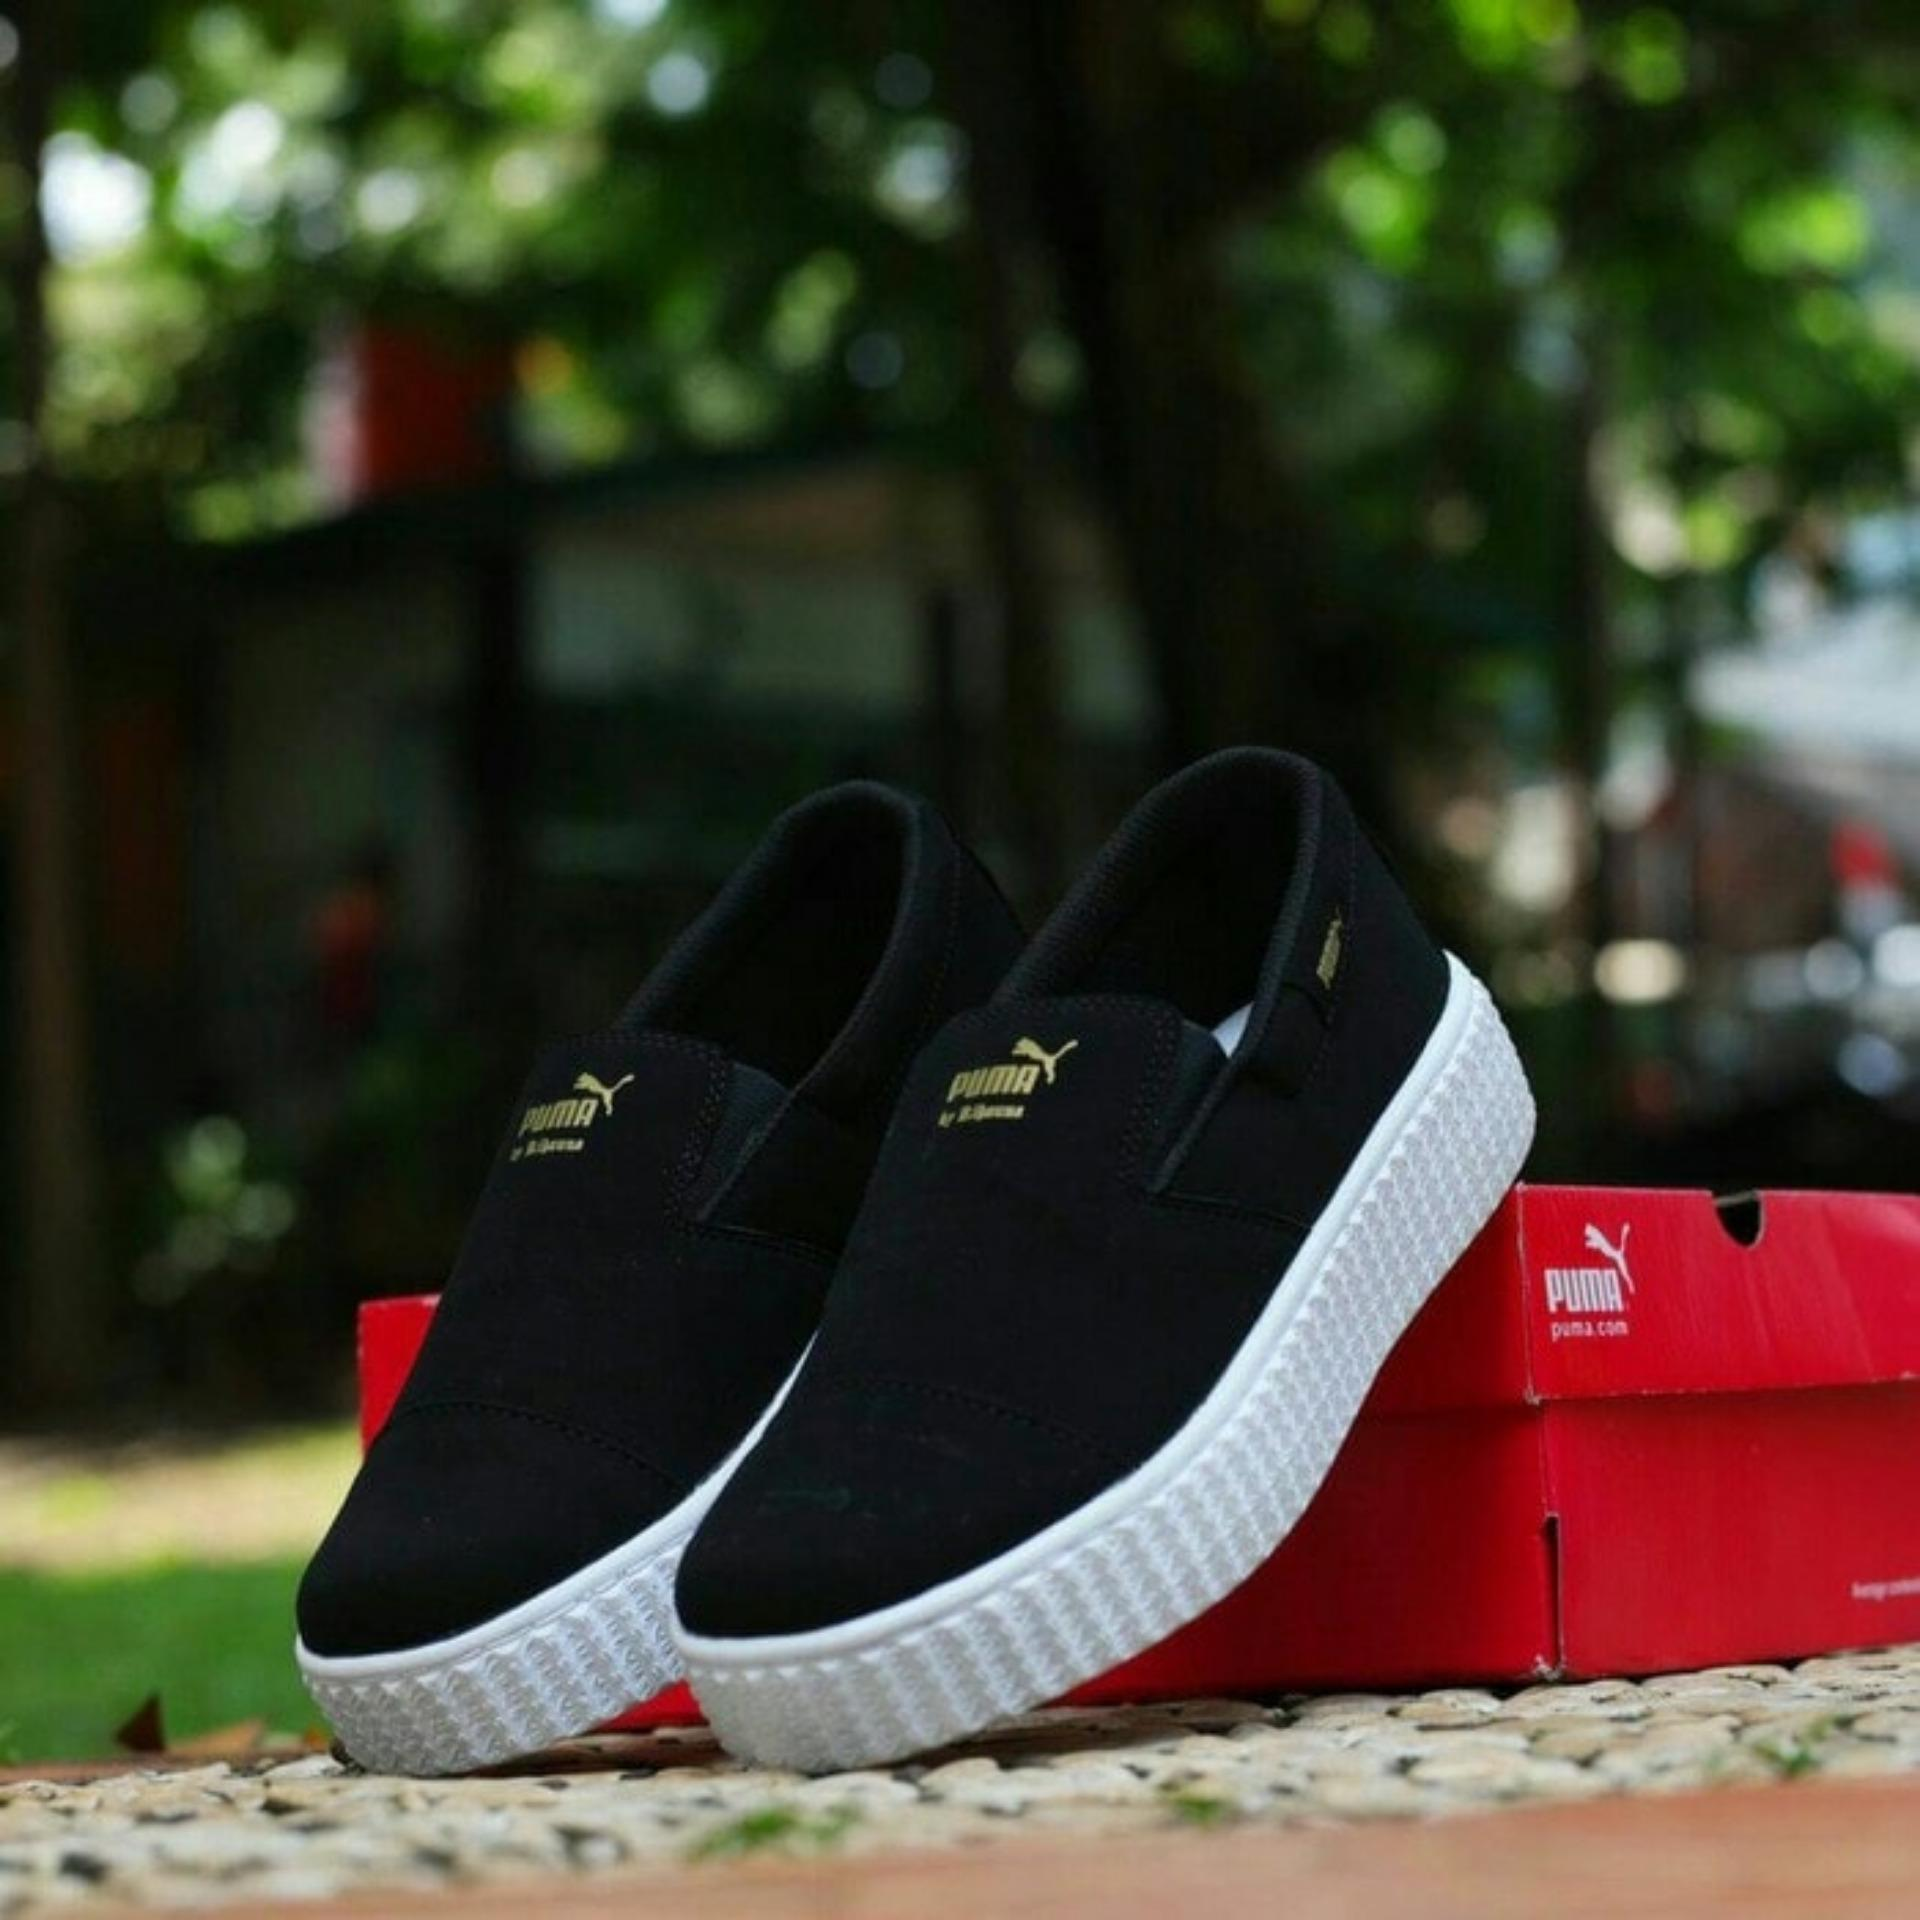 Sepatu Kets Puma Rihanna Replika Hitammaruncoklat - Daftar Harga ... 1060dd729c